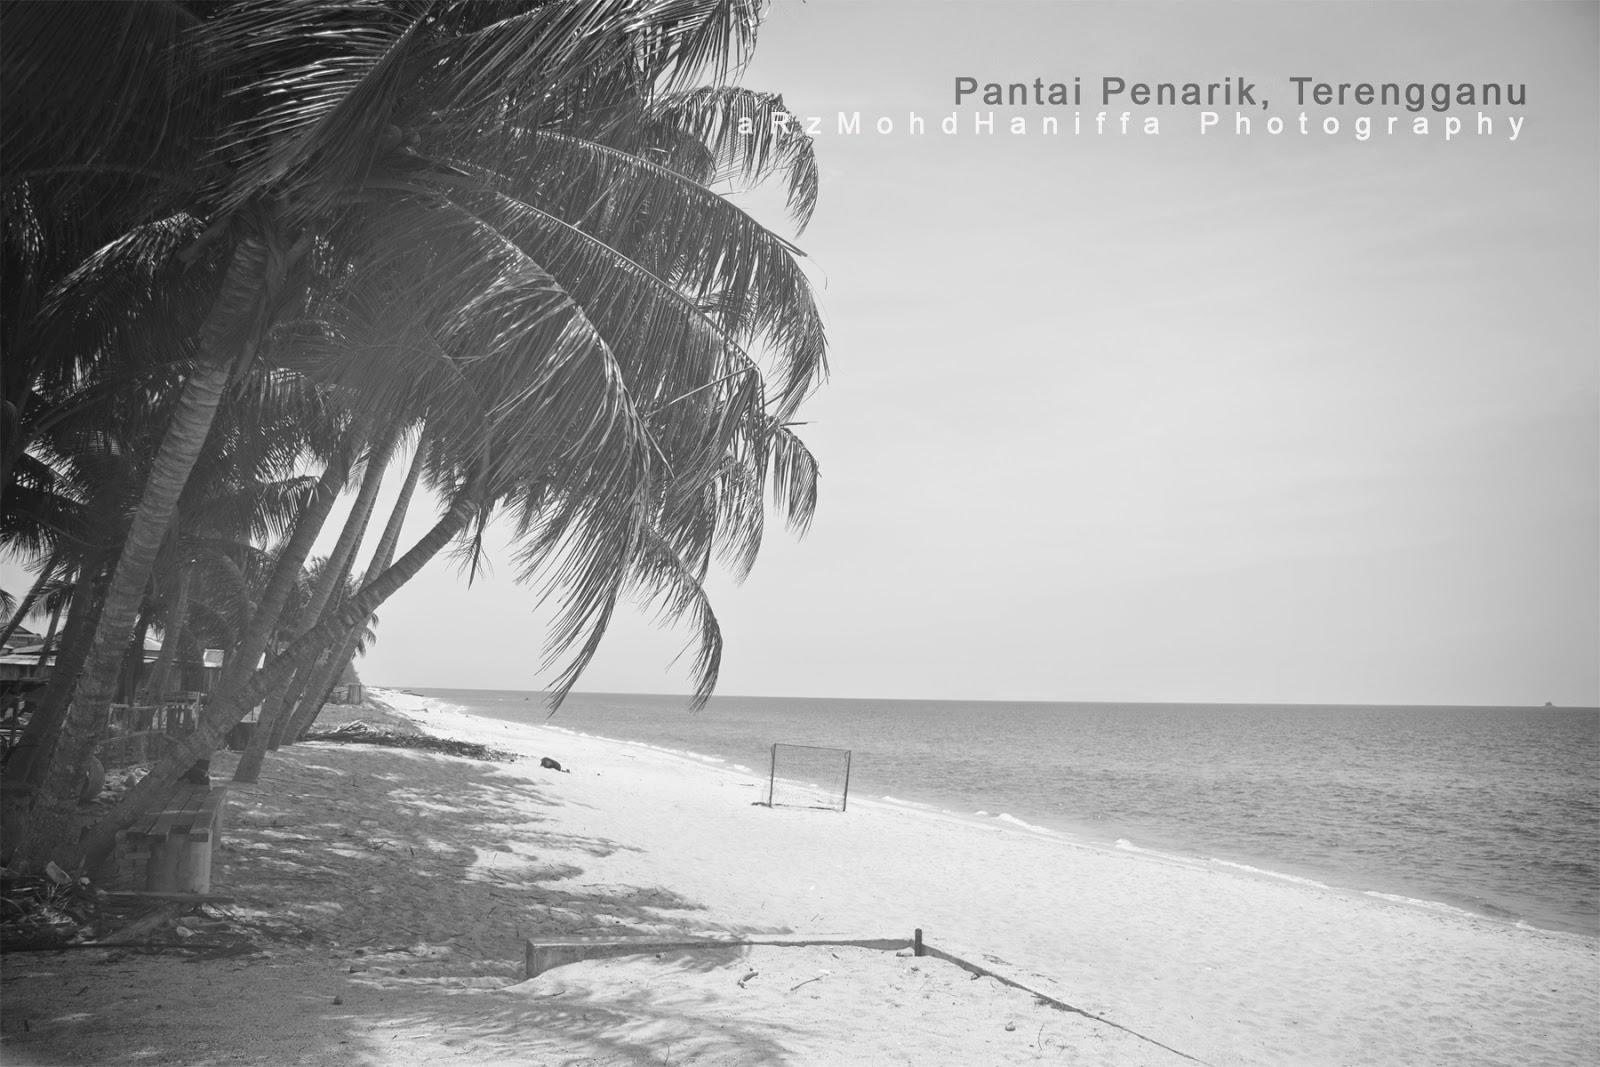 pantai penarik terengganu, pantai penarik, Pantai, Penarik, Terengganu, arzmohdhaniffa, gambar cantik, gambar pantai cantik, gambar pantai penarik cantik,